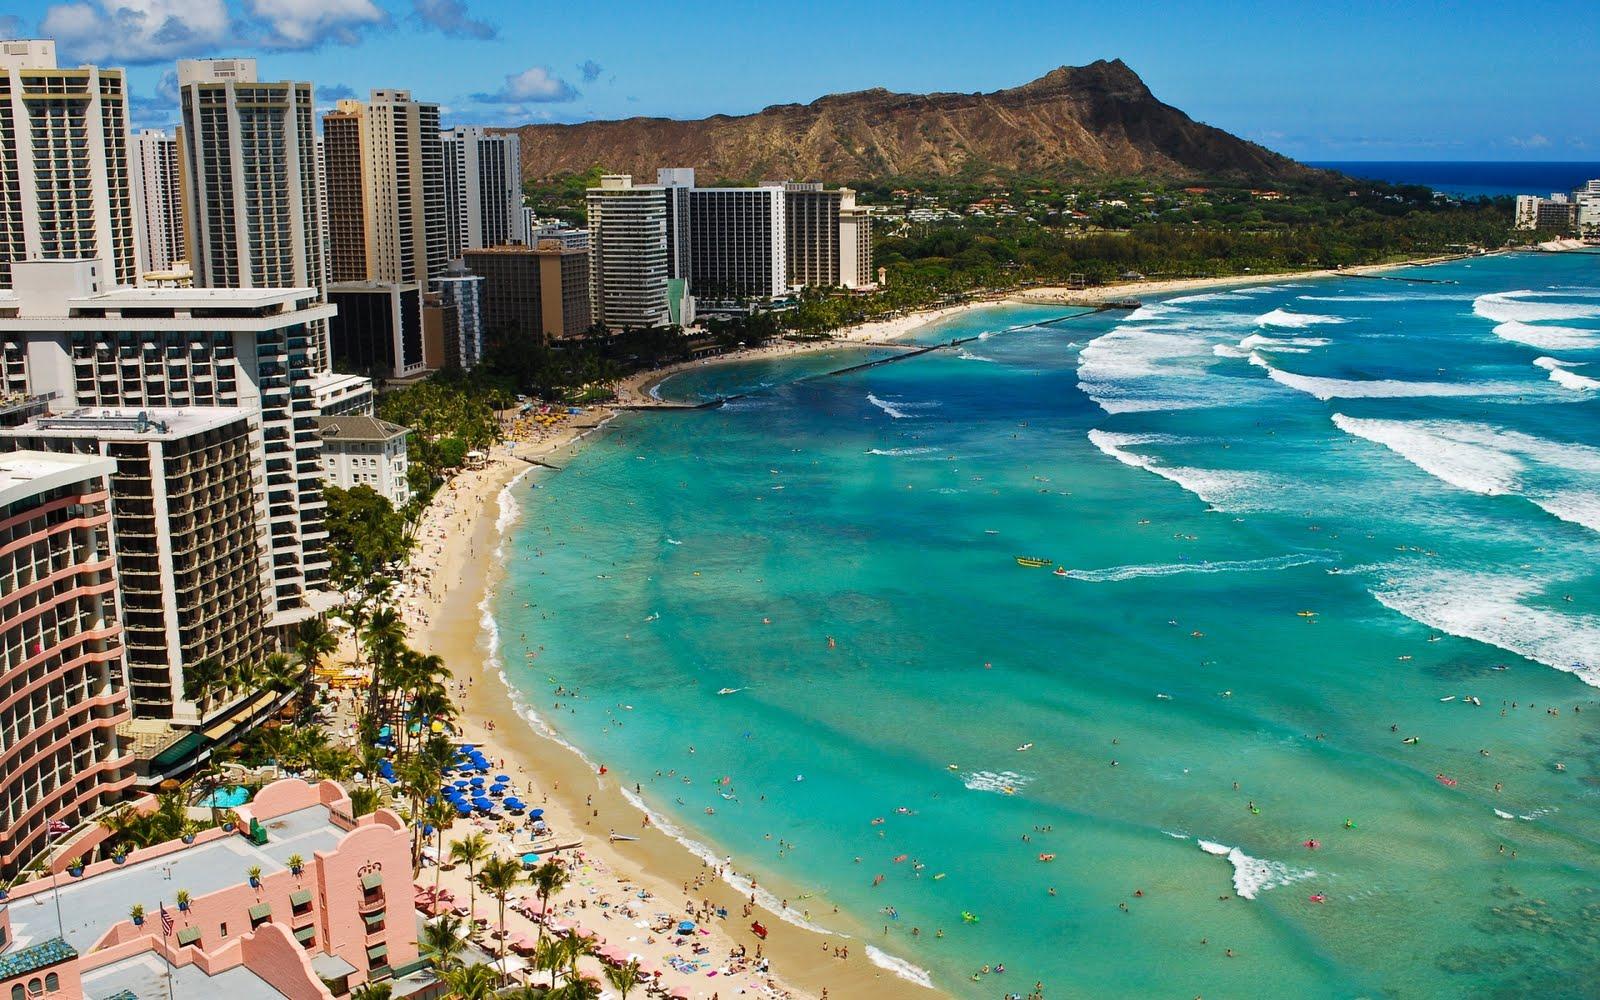 http://2.bp.blogspot.com/-rz21TFM1gBk/TlGM32v7W3I/AAAAAAAAkTQ/7IW03Y2J1WA/s1600/waikiki-beach-hawaii-1920x1200.jpg